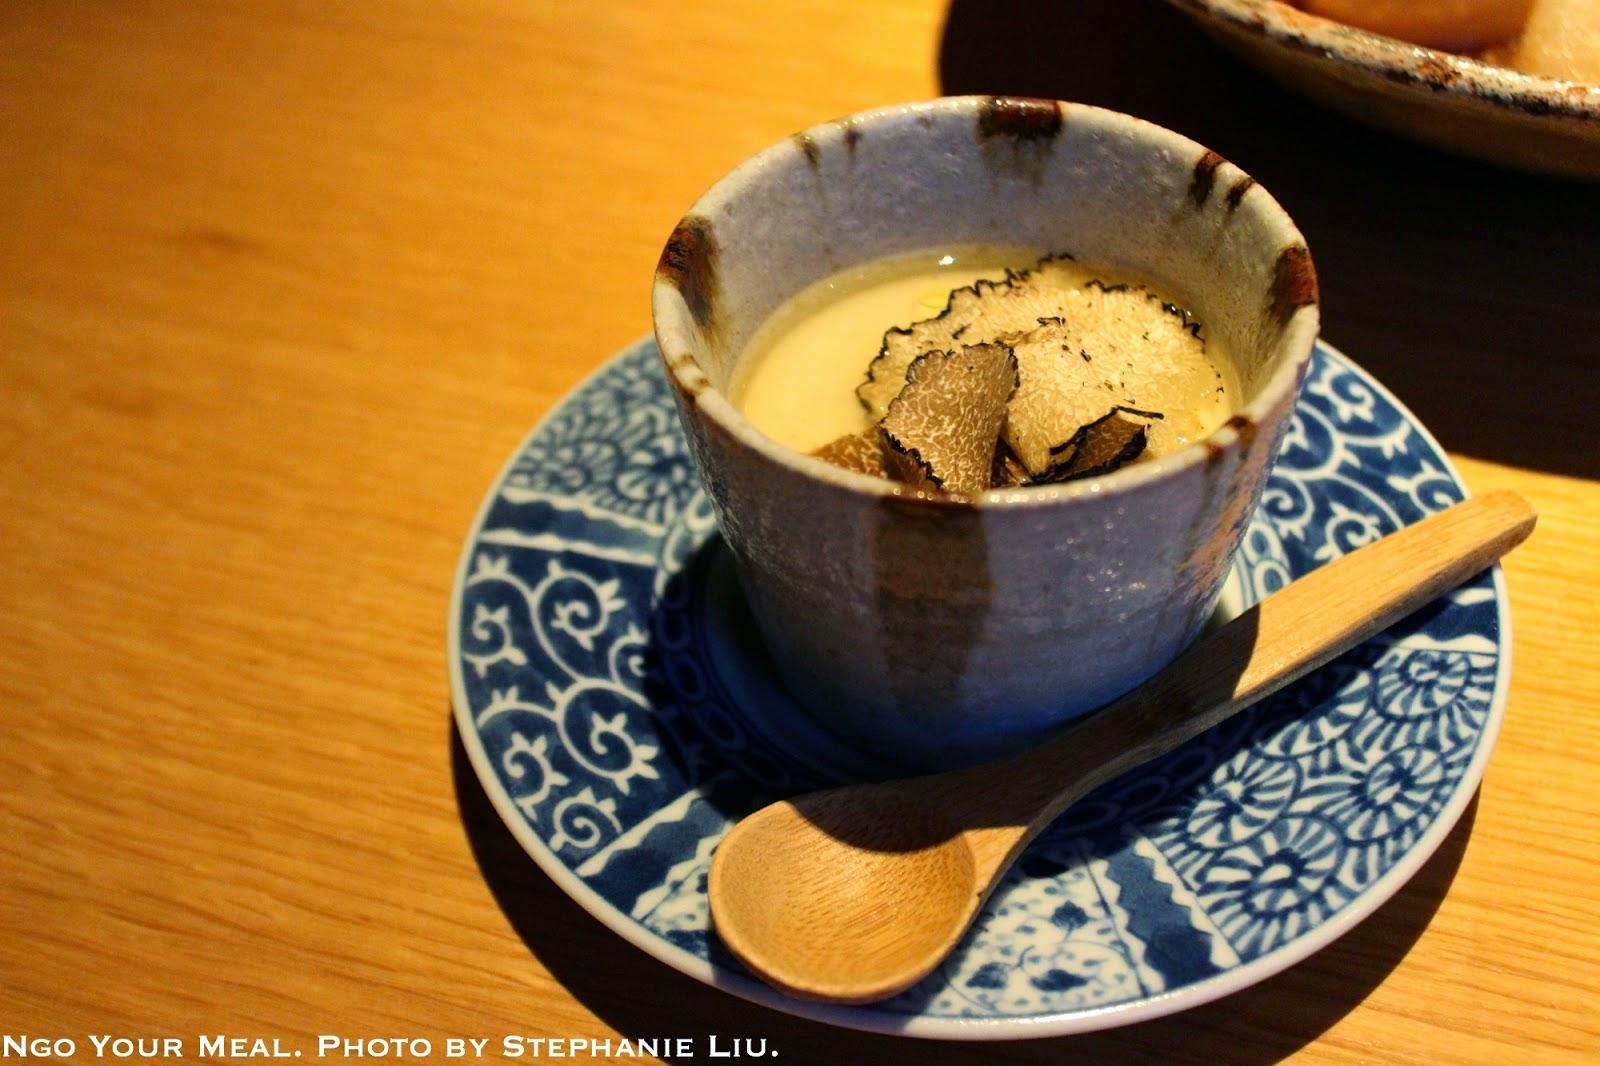 Black Truffle Chawanmushi with Shaved Black Truffles at EN Japanese Brasserie